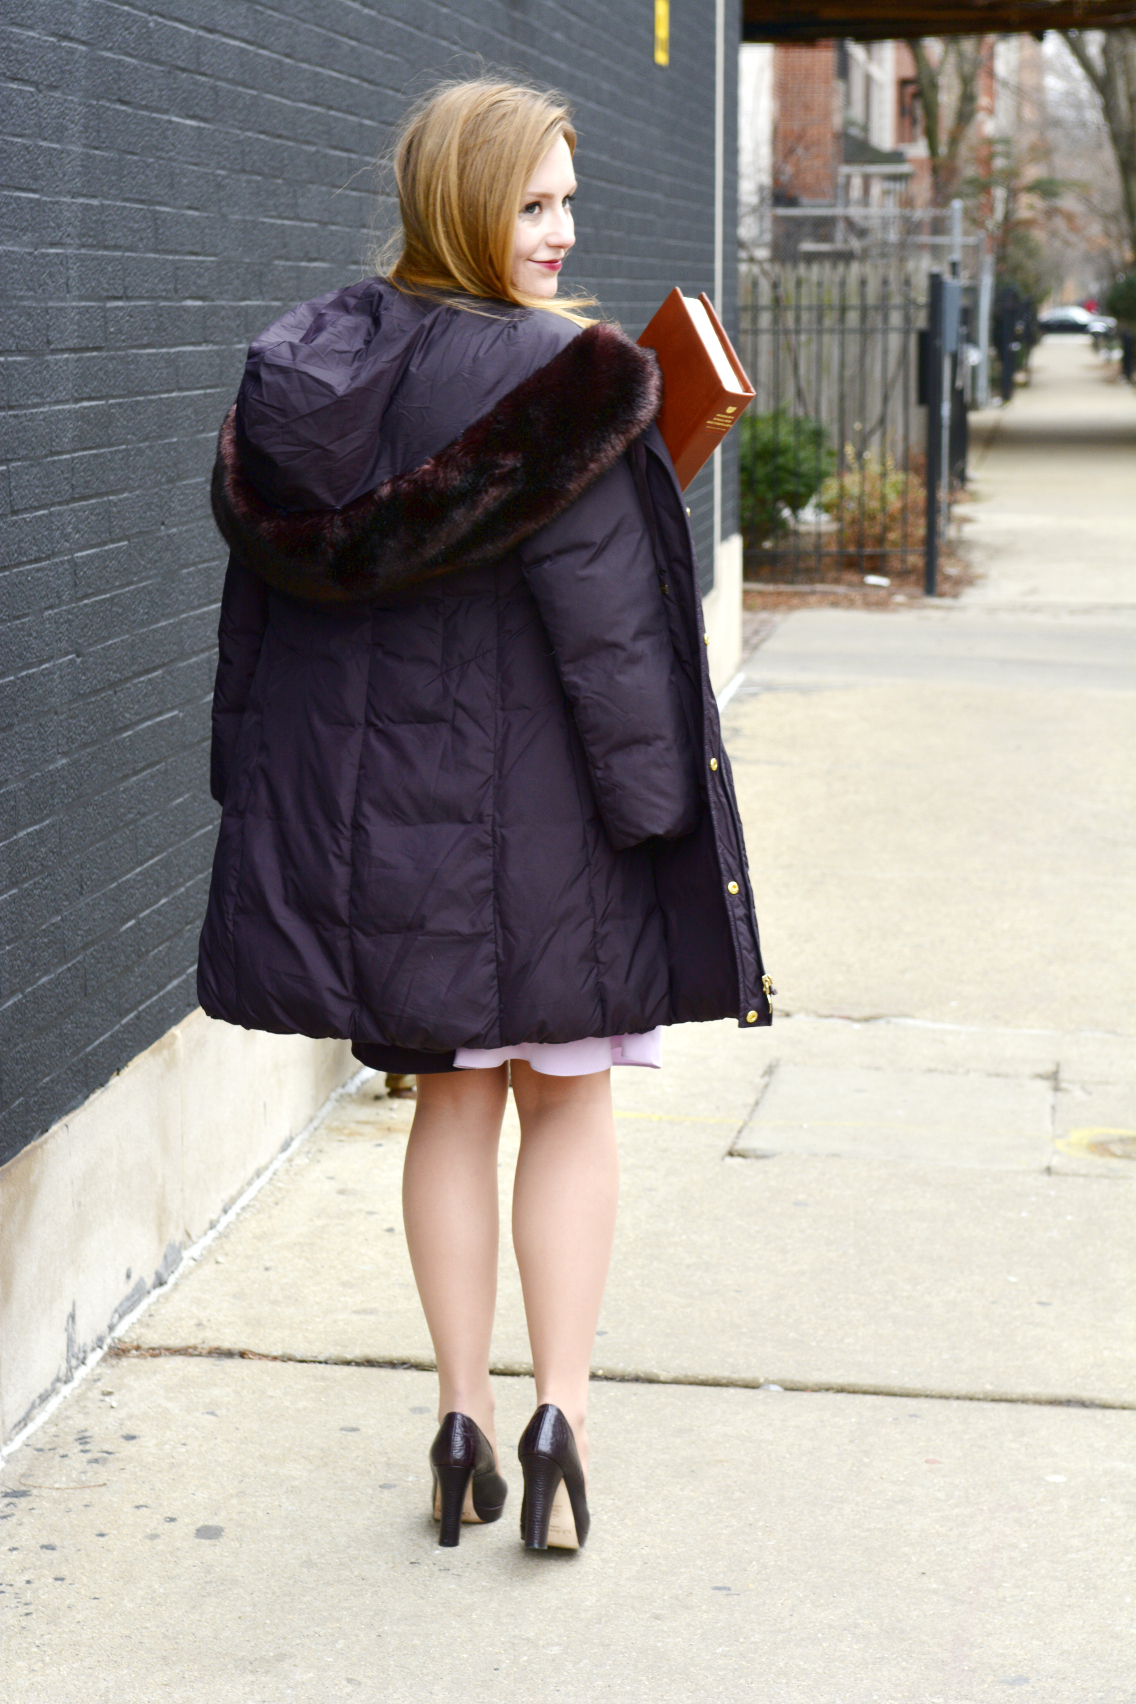 3.1 Phillip Lim Colorblock Dress Kate Spade Dictionary Clutch 11